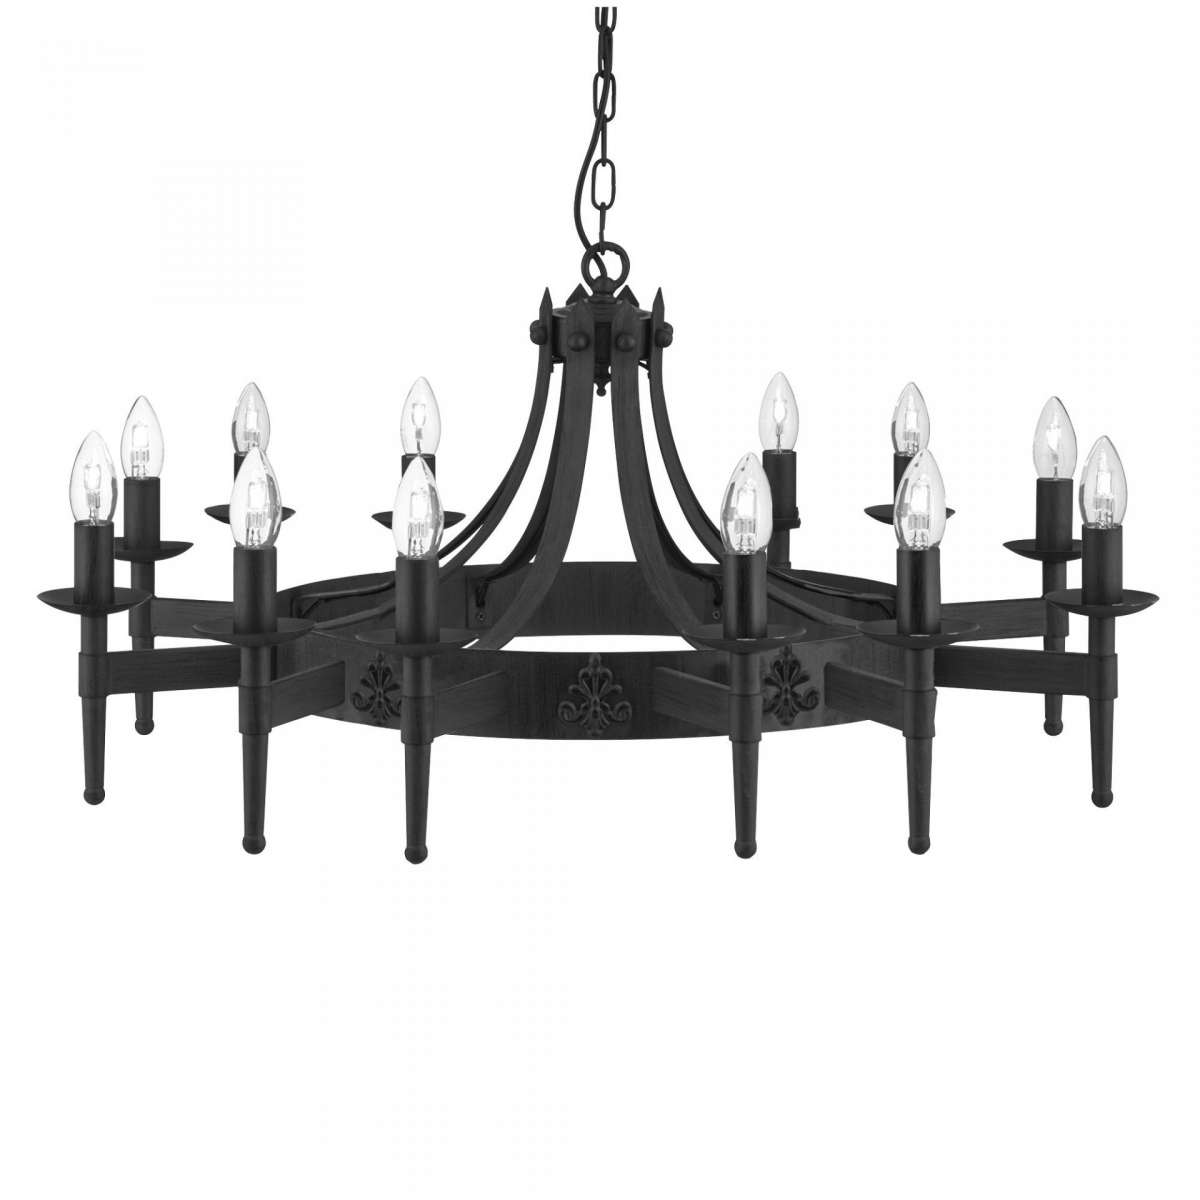 Cartwheel 12 Light Ceiling Wrought Iron Black